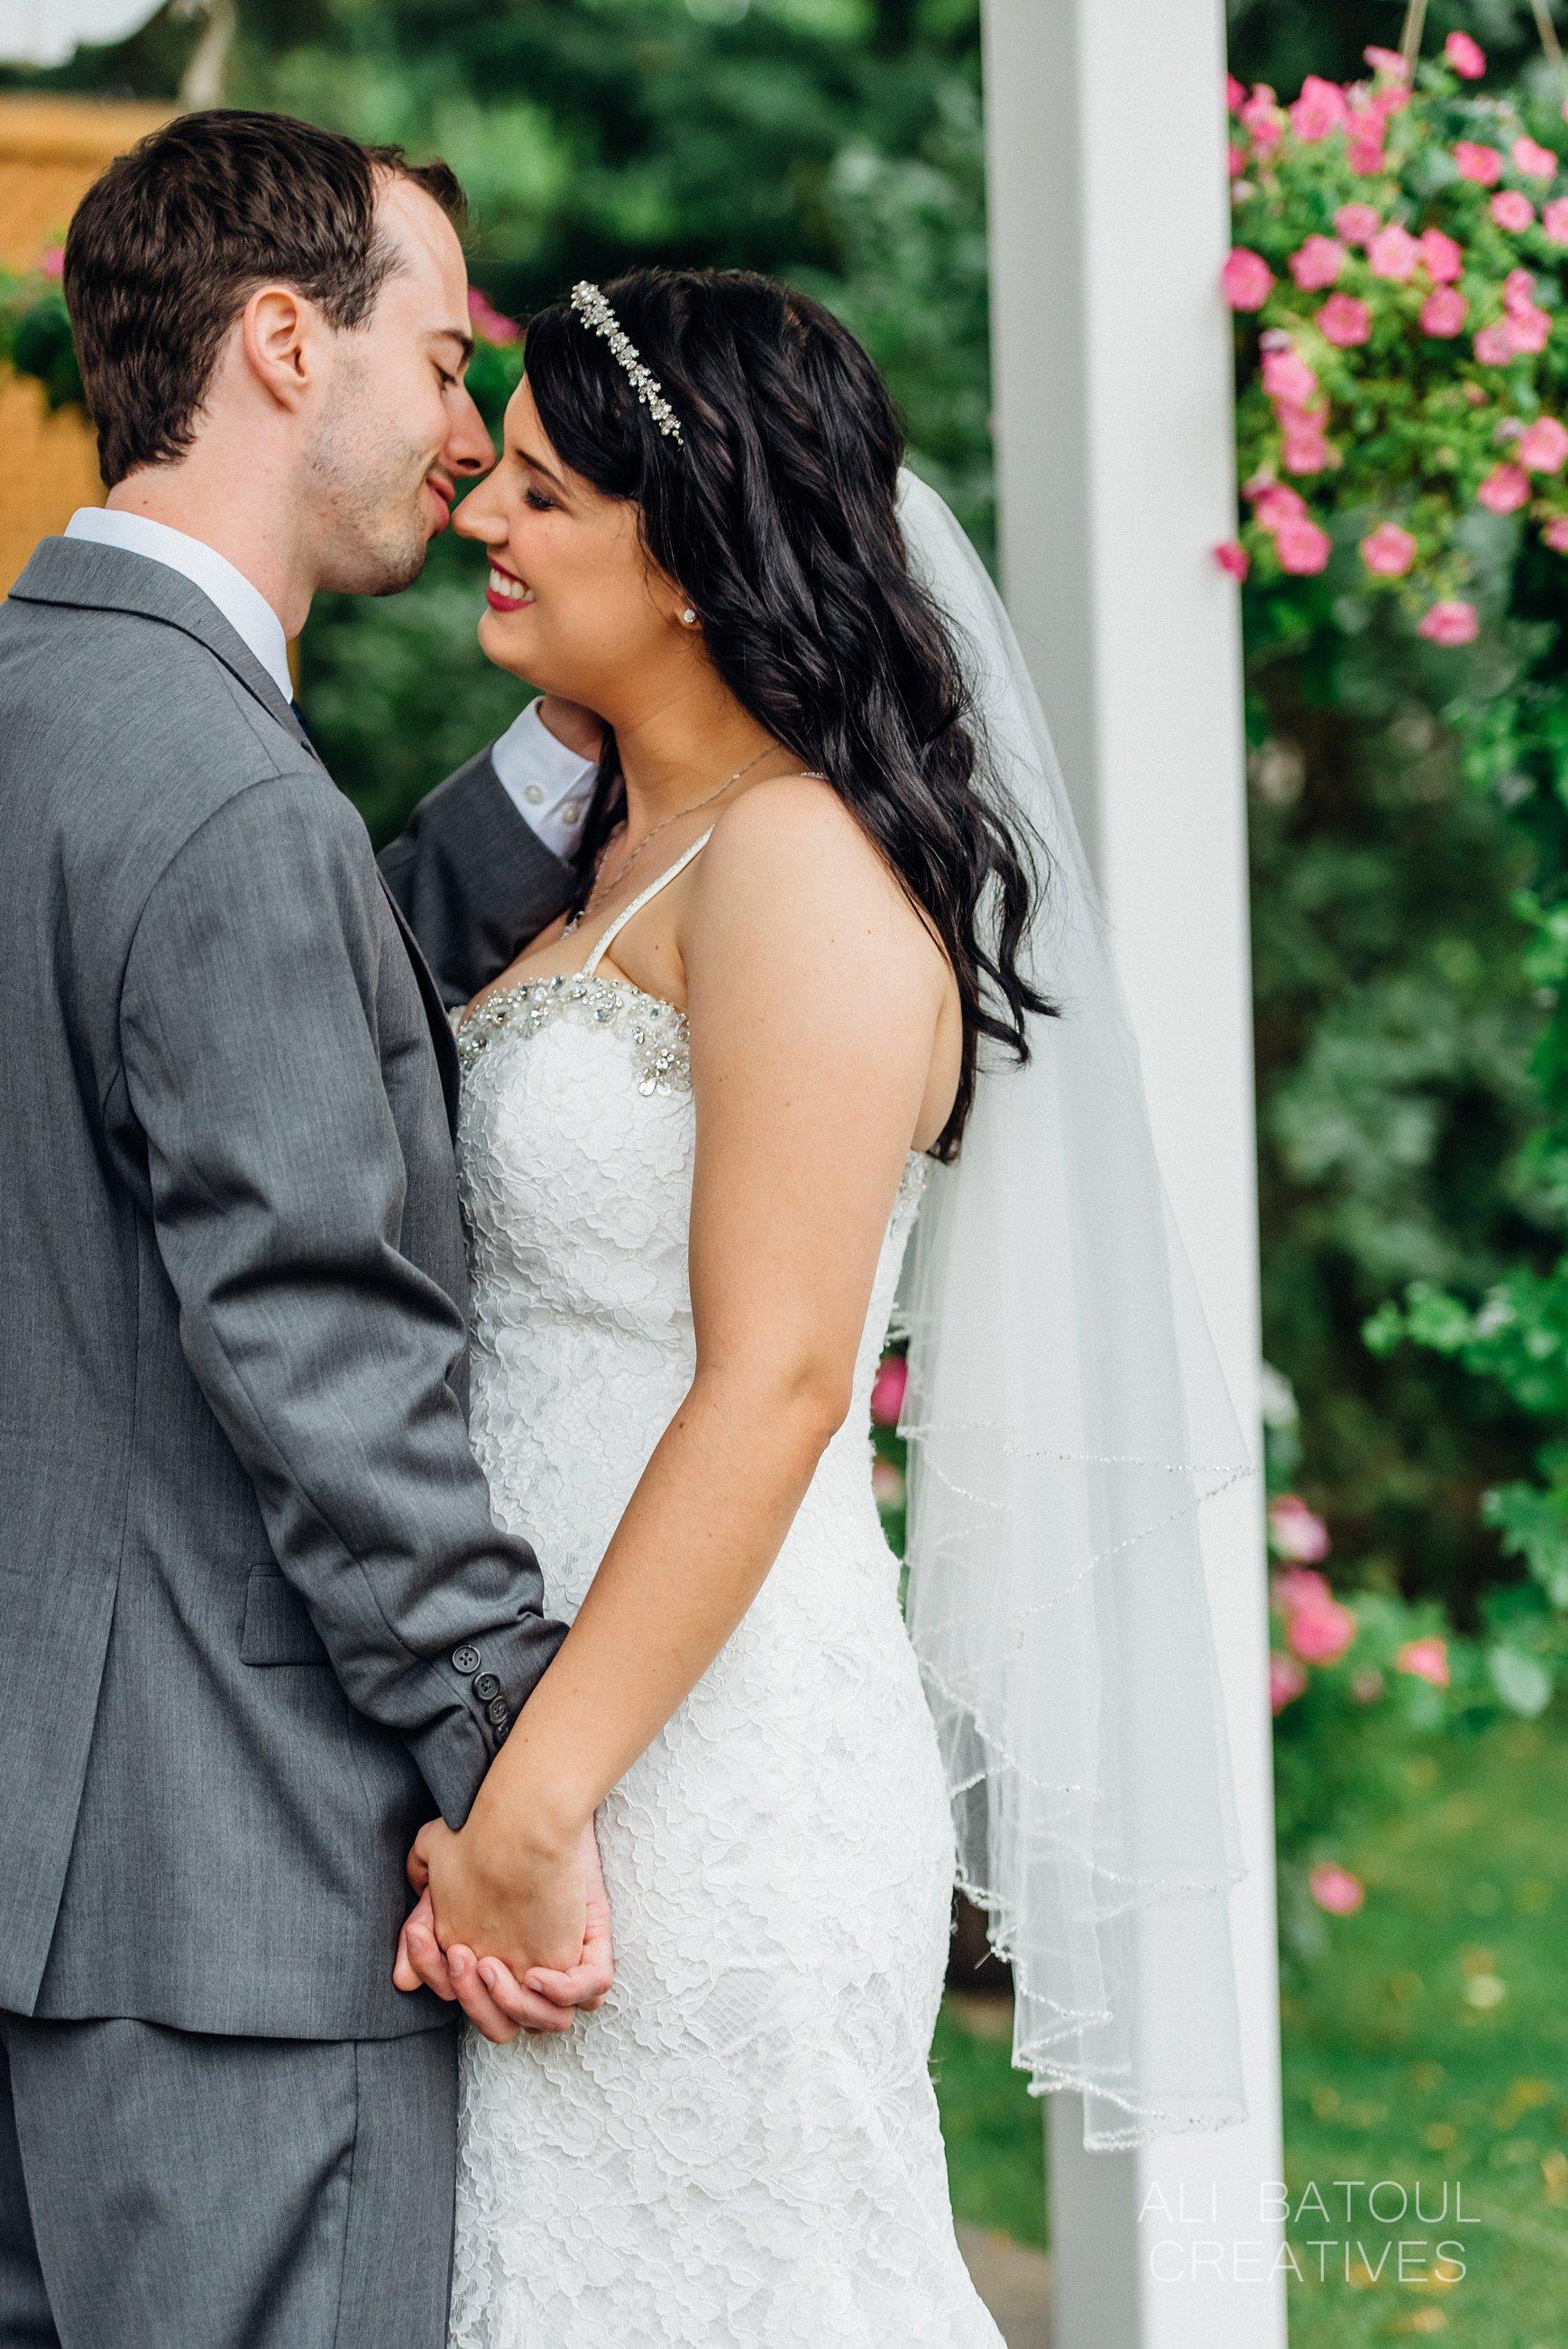 Jocelyn + Steve At The Schoolhouse Wedding - Ali and Batoul Fine Art Wedding Photography_0053.jpg